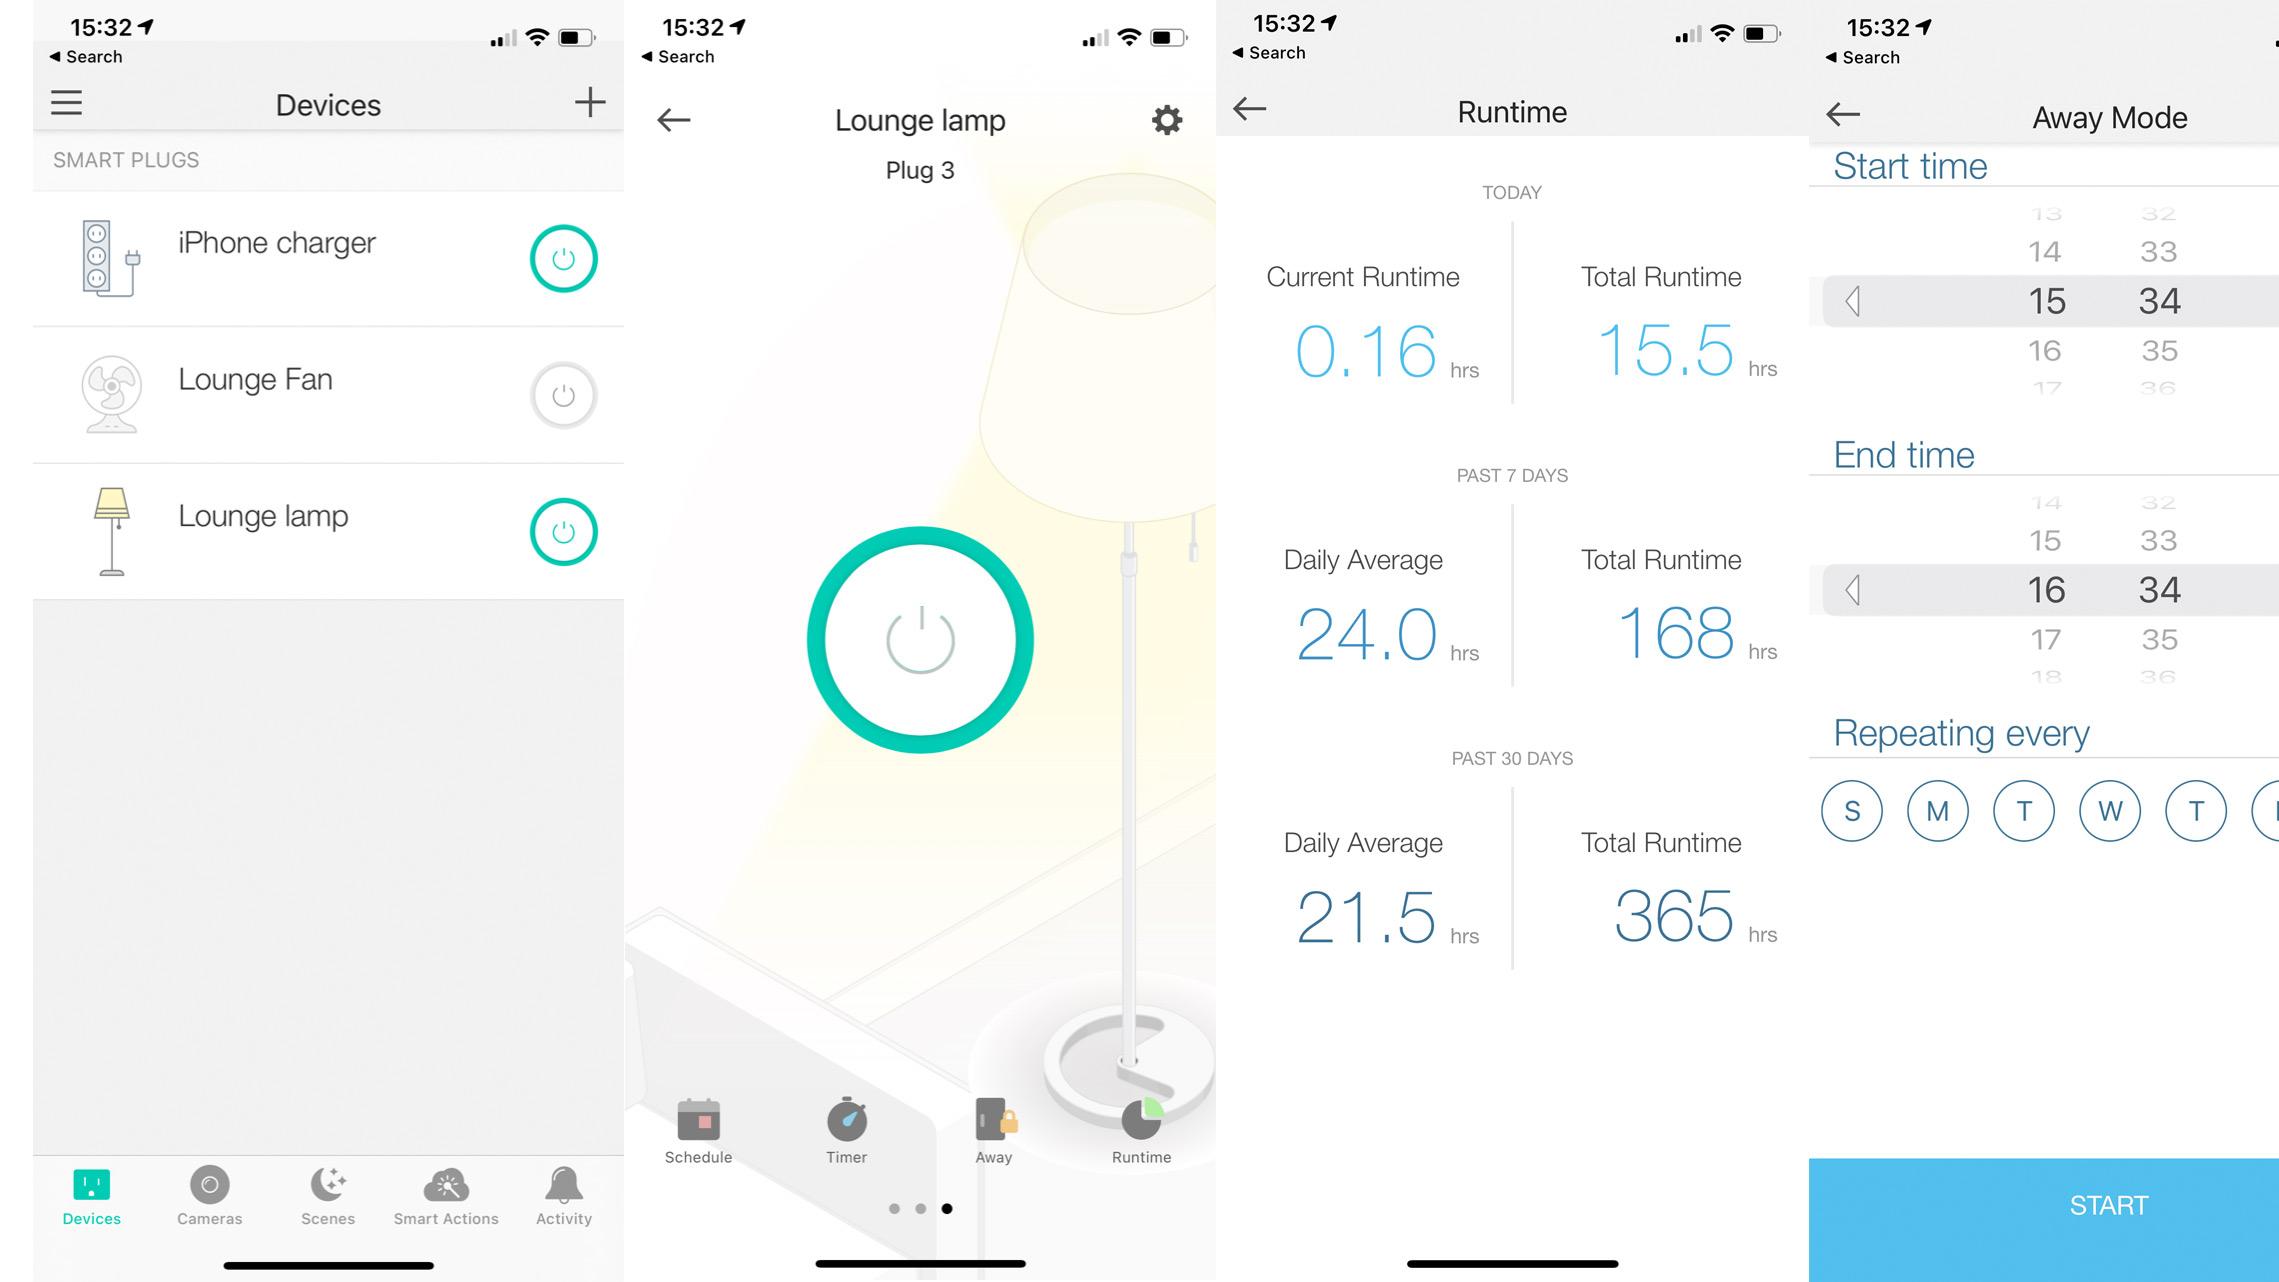 TP-Link Kasa Smart Wi-Fi Powerstrip KP303'S app